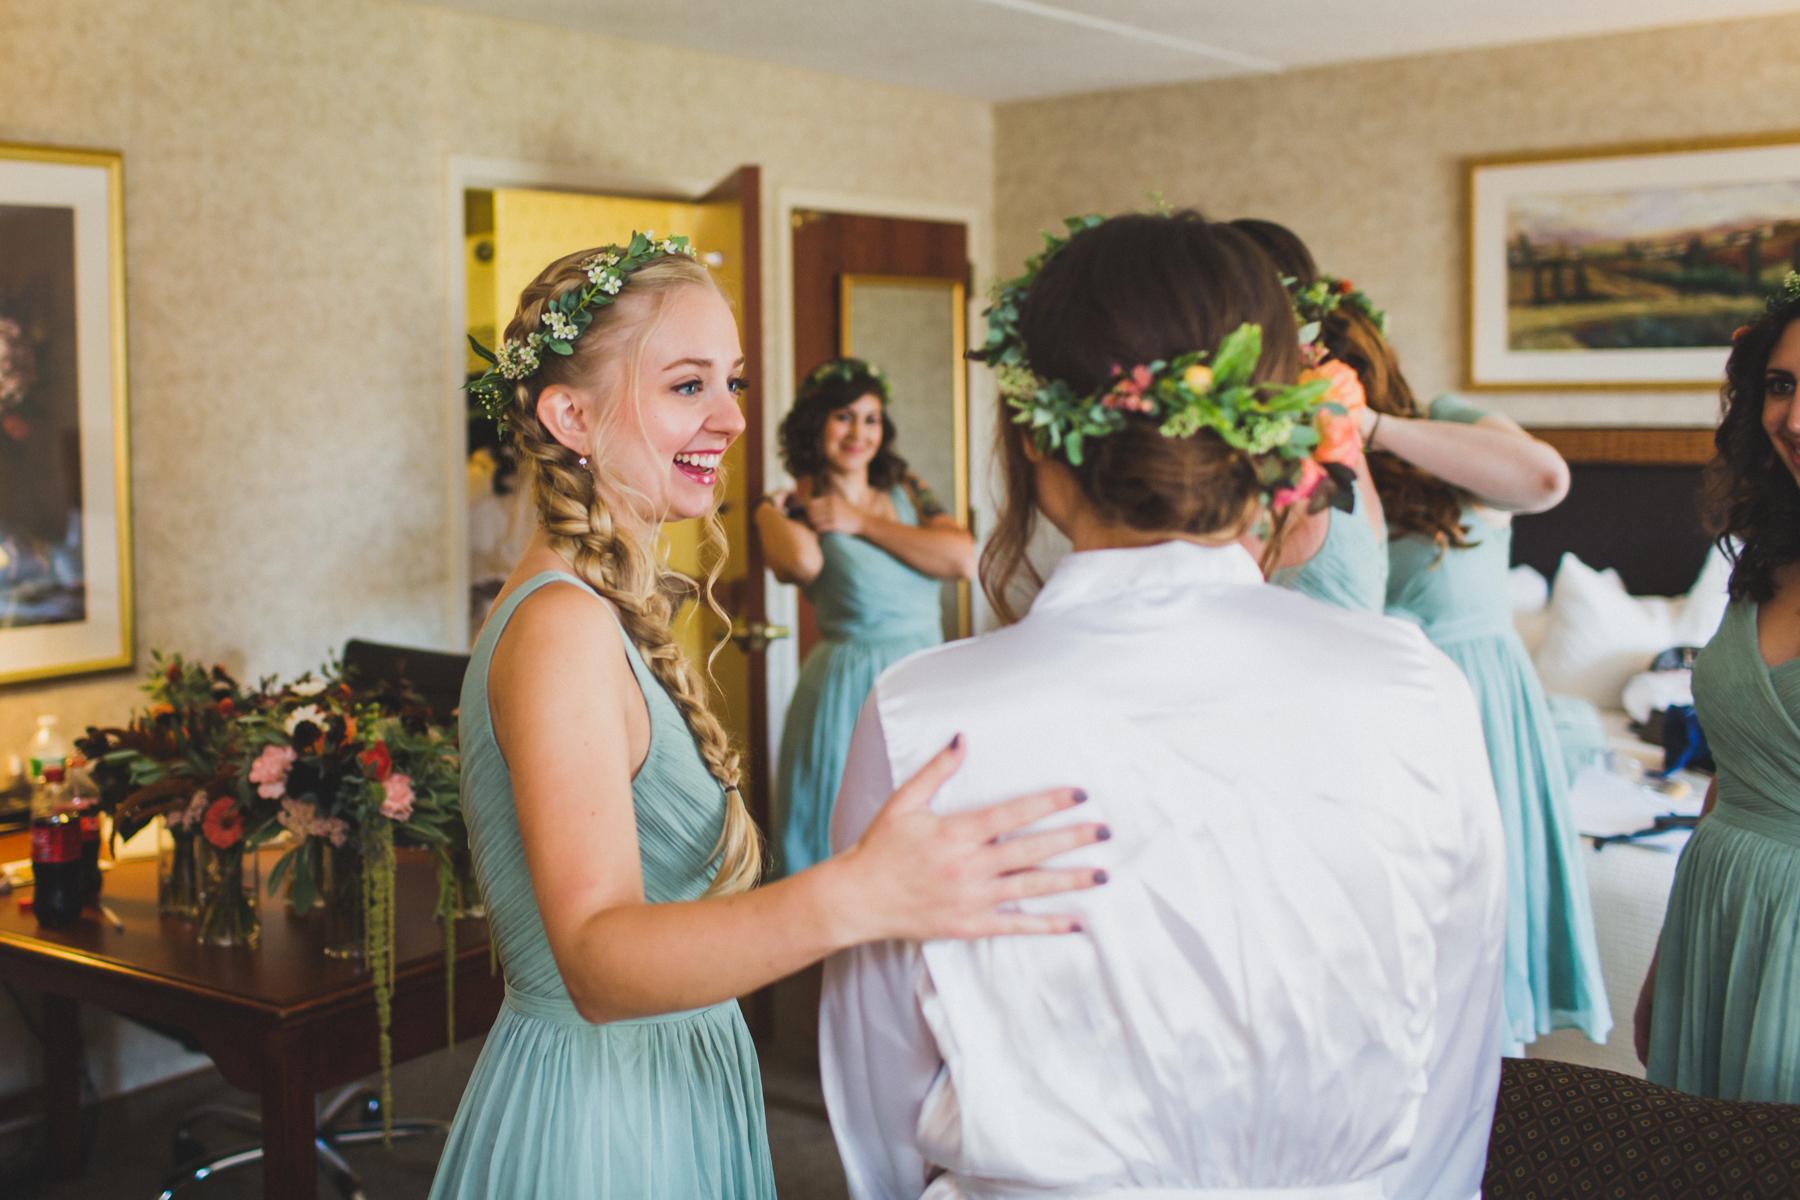 Long-Island-Documentary-Wedding-Photography-Summer-Tent-Wedding-in-New-York-11.jpg